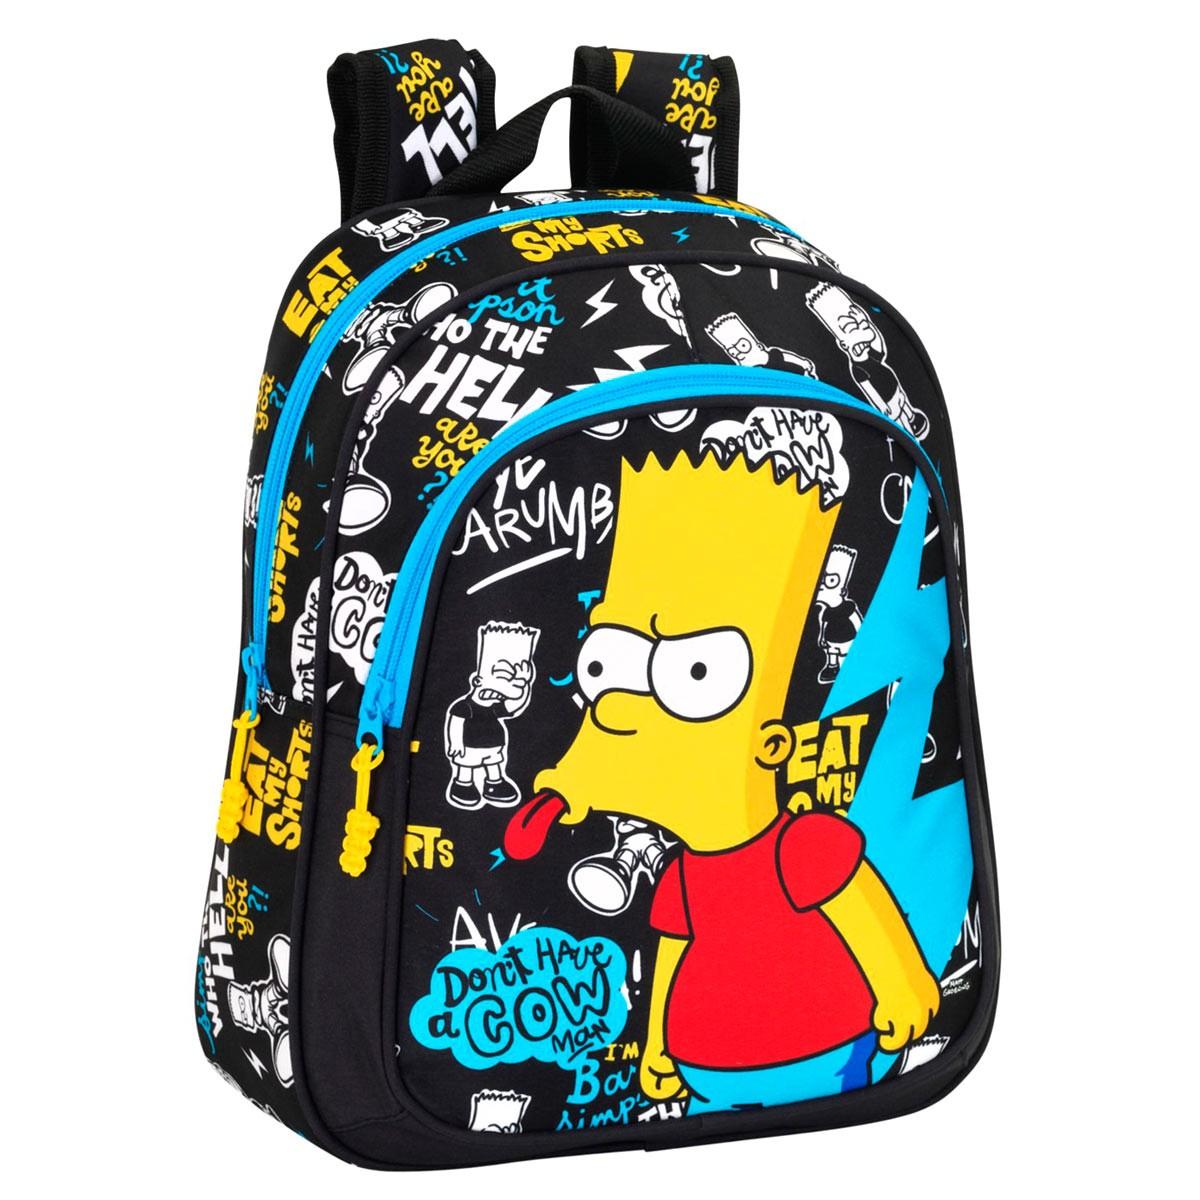 Premium Bart Simpson Backpack Small 3b1cc7634db21